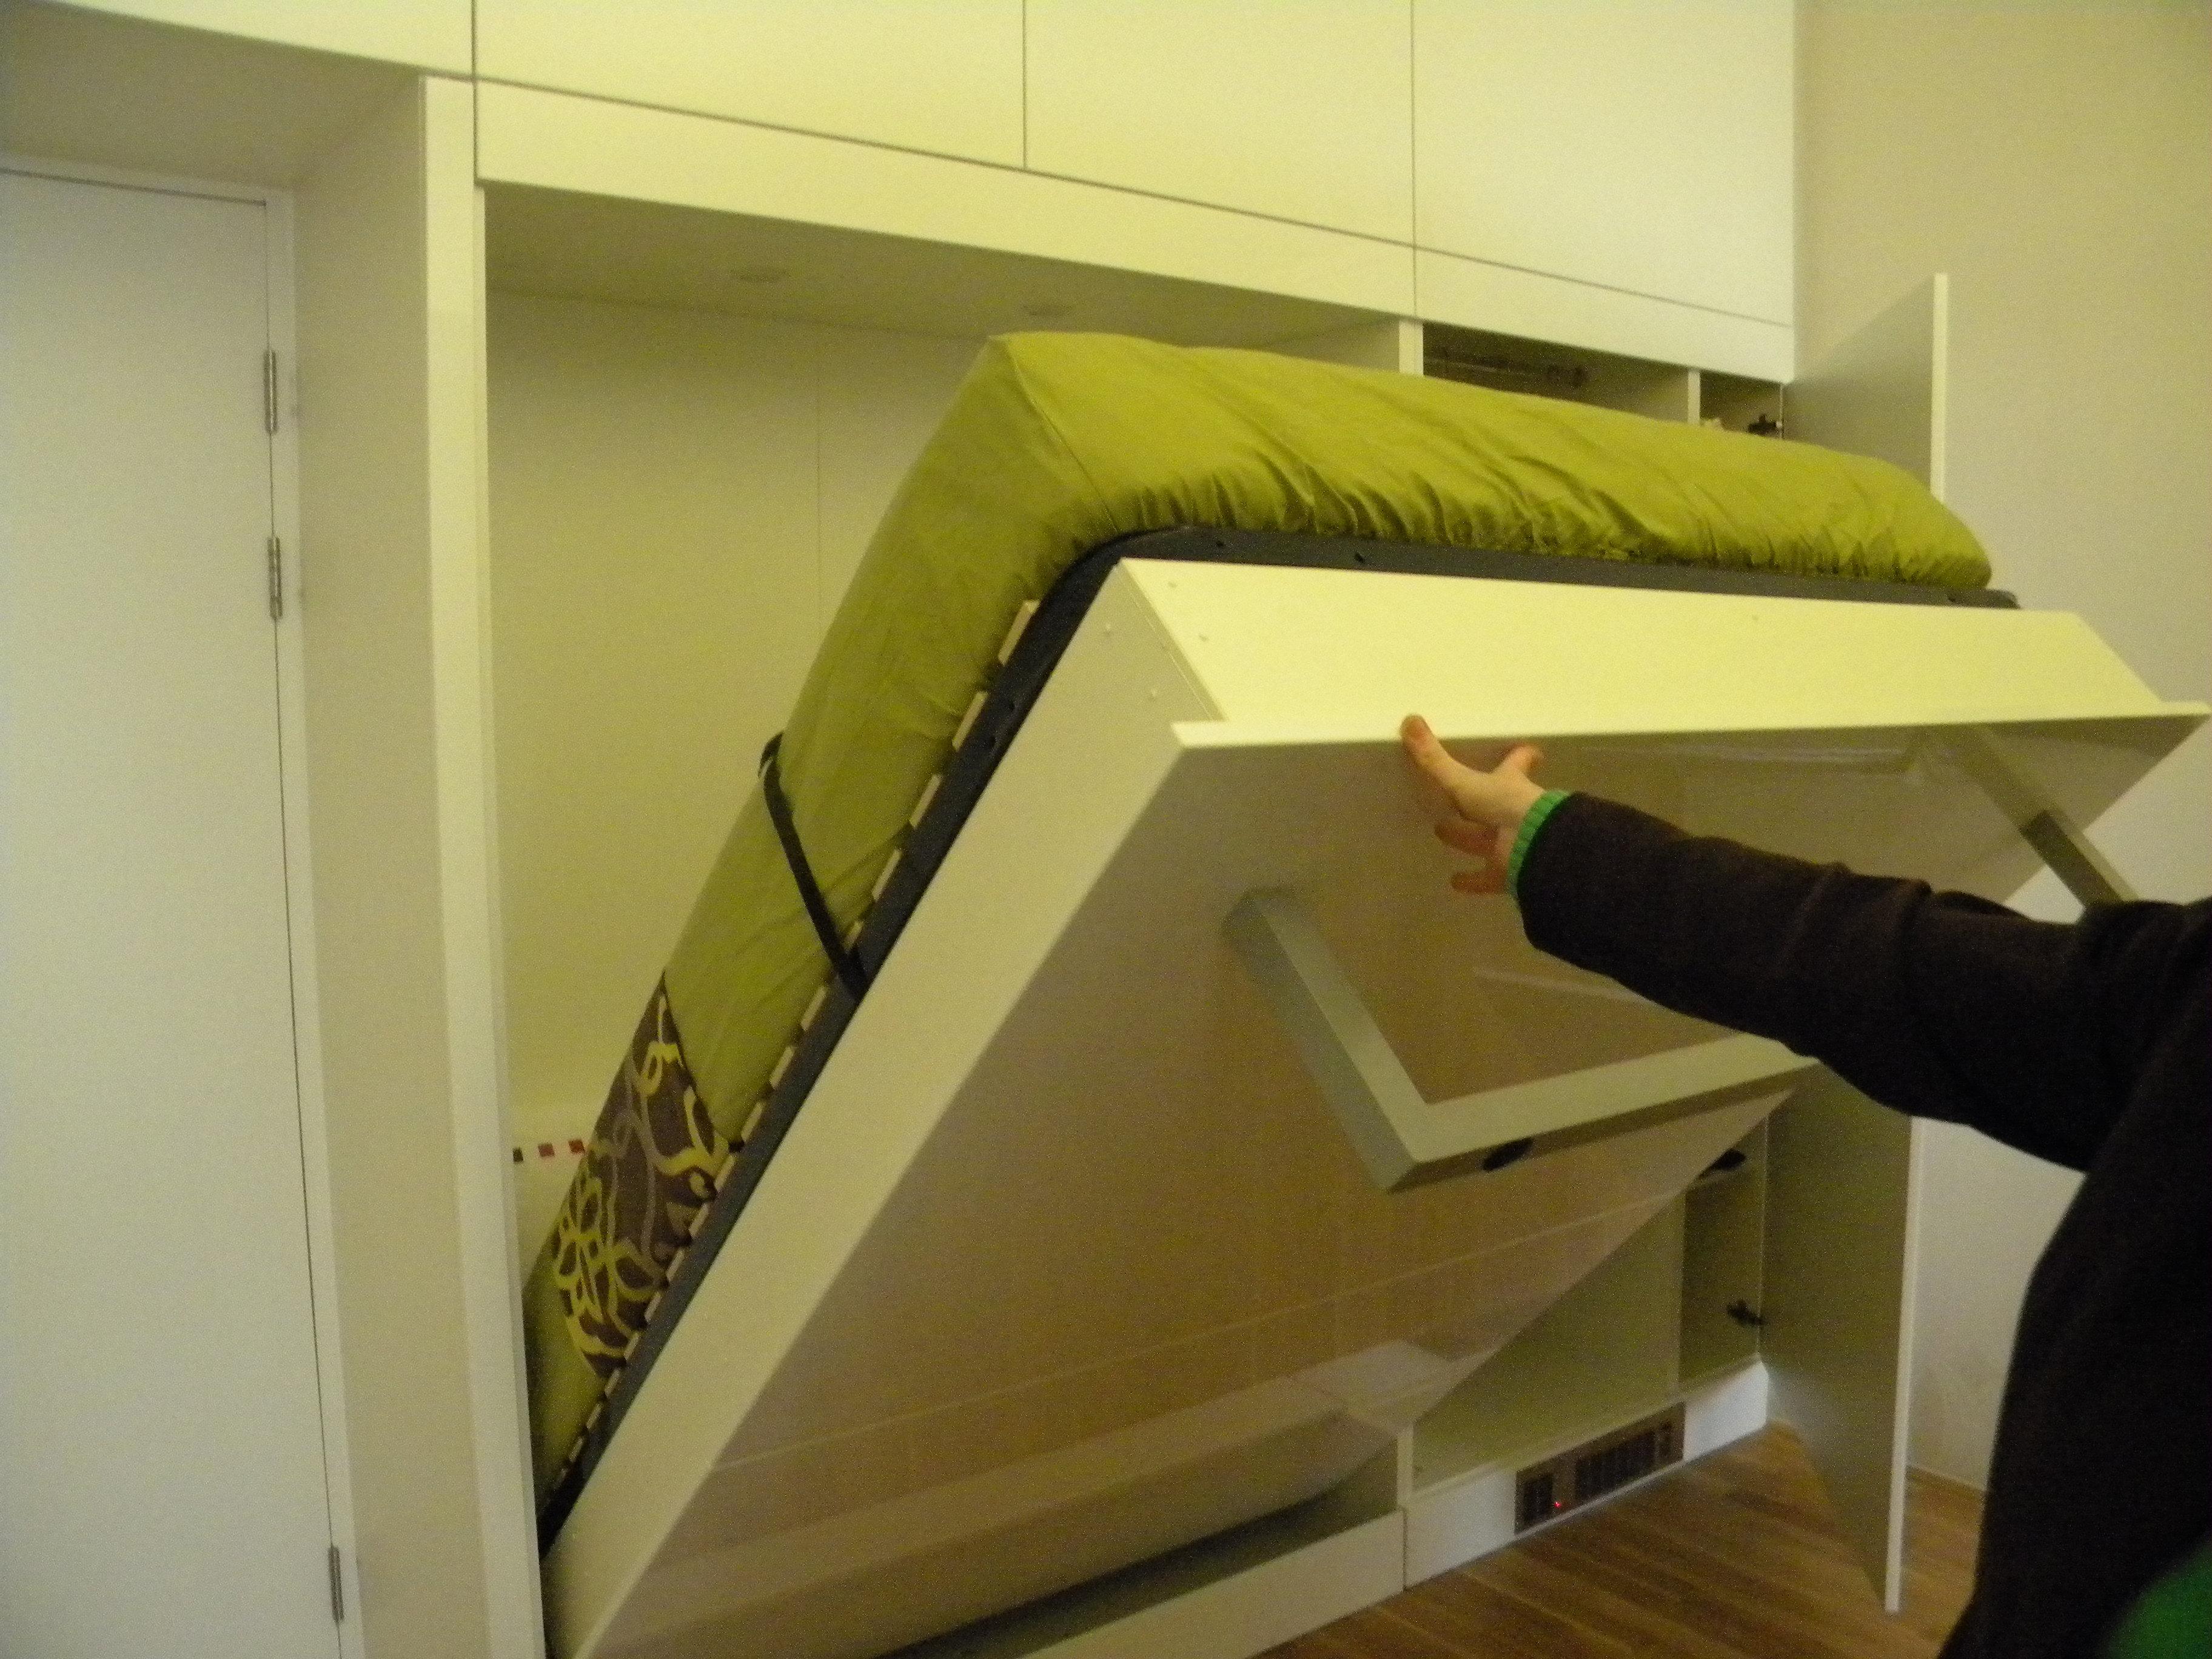 ibedz wall bed. Black Bedroom Furniture Sets. Home Design Ideas